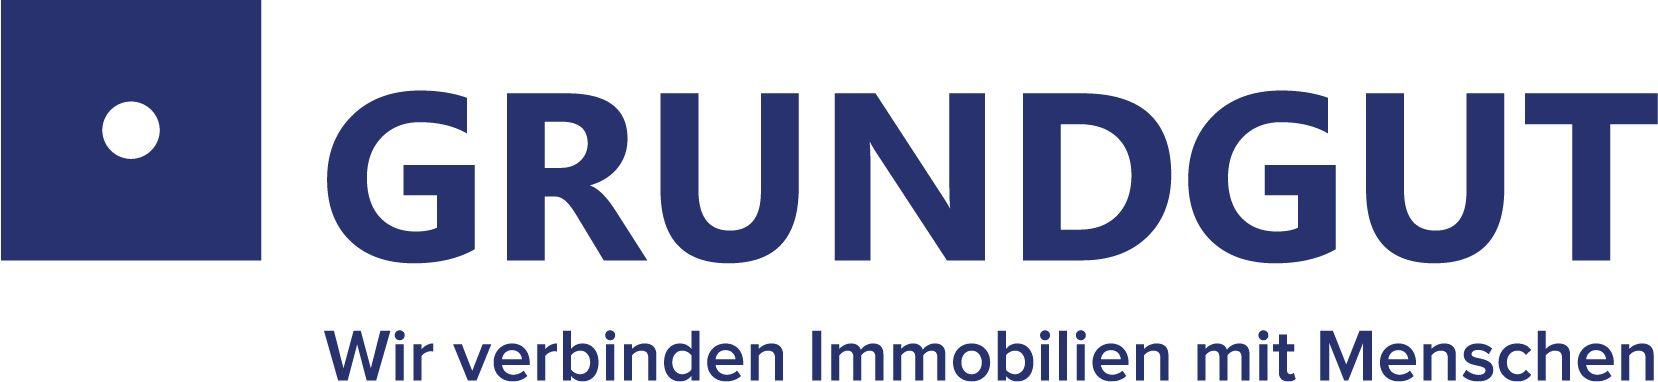 Grundgut AG Logo